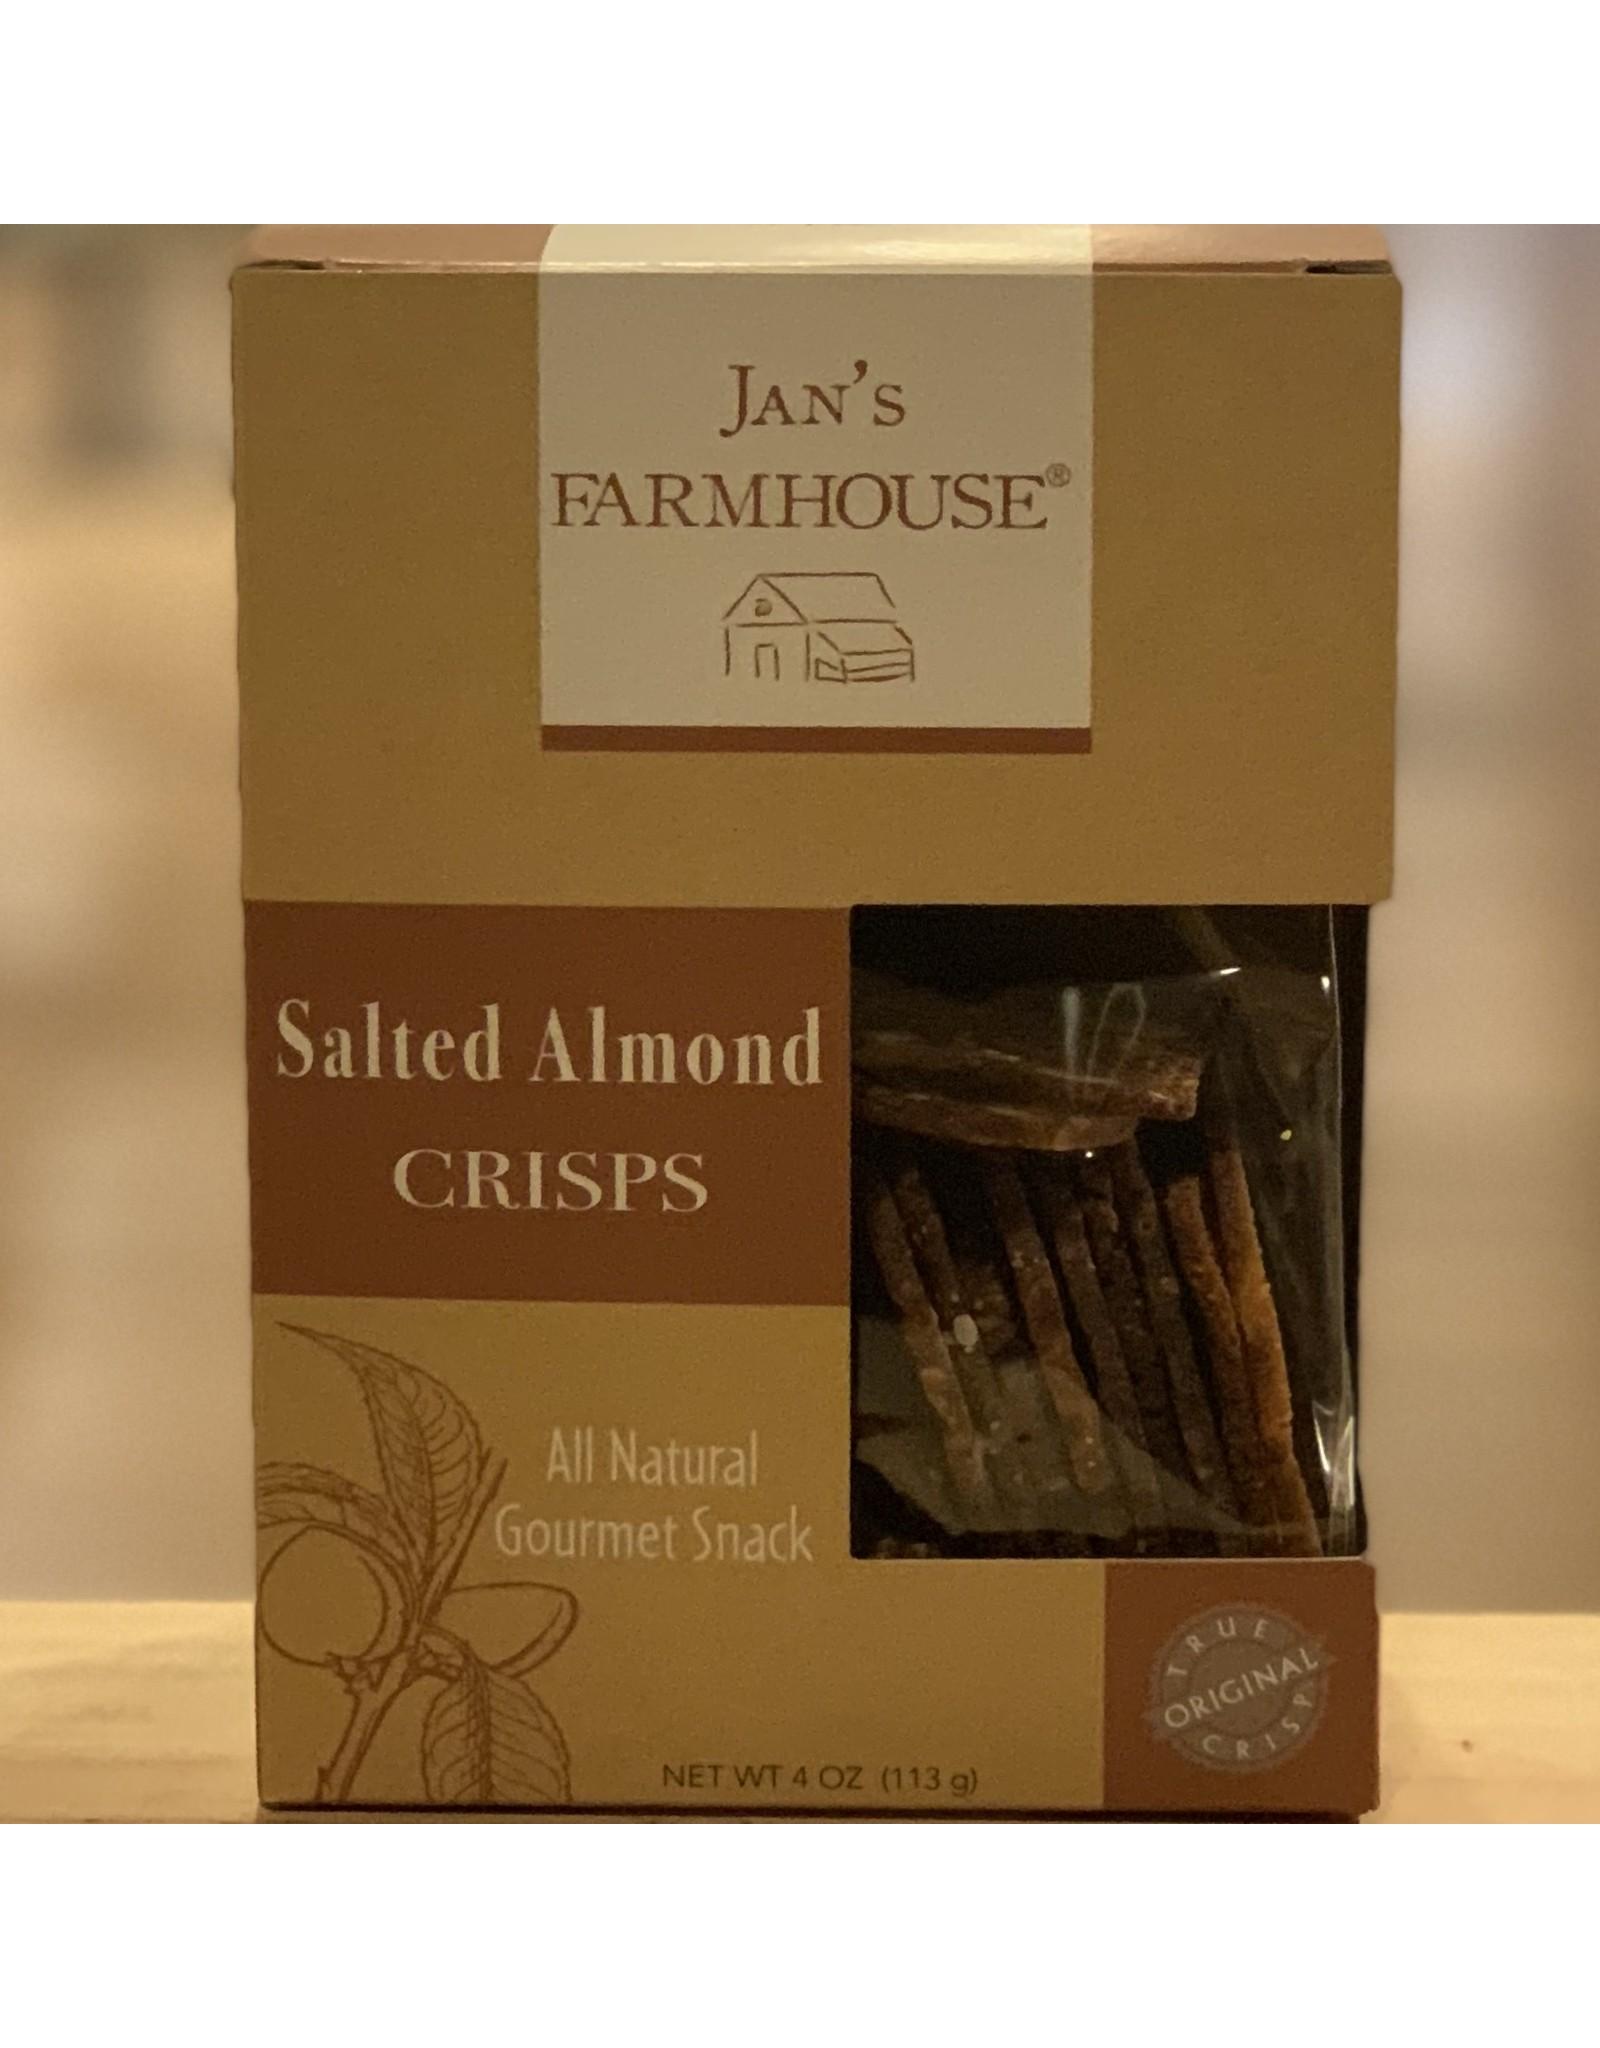 Cracker Jan's Farmhouse ''Salted Almond'' Crisps - Stowe, Vermont